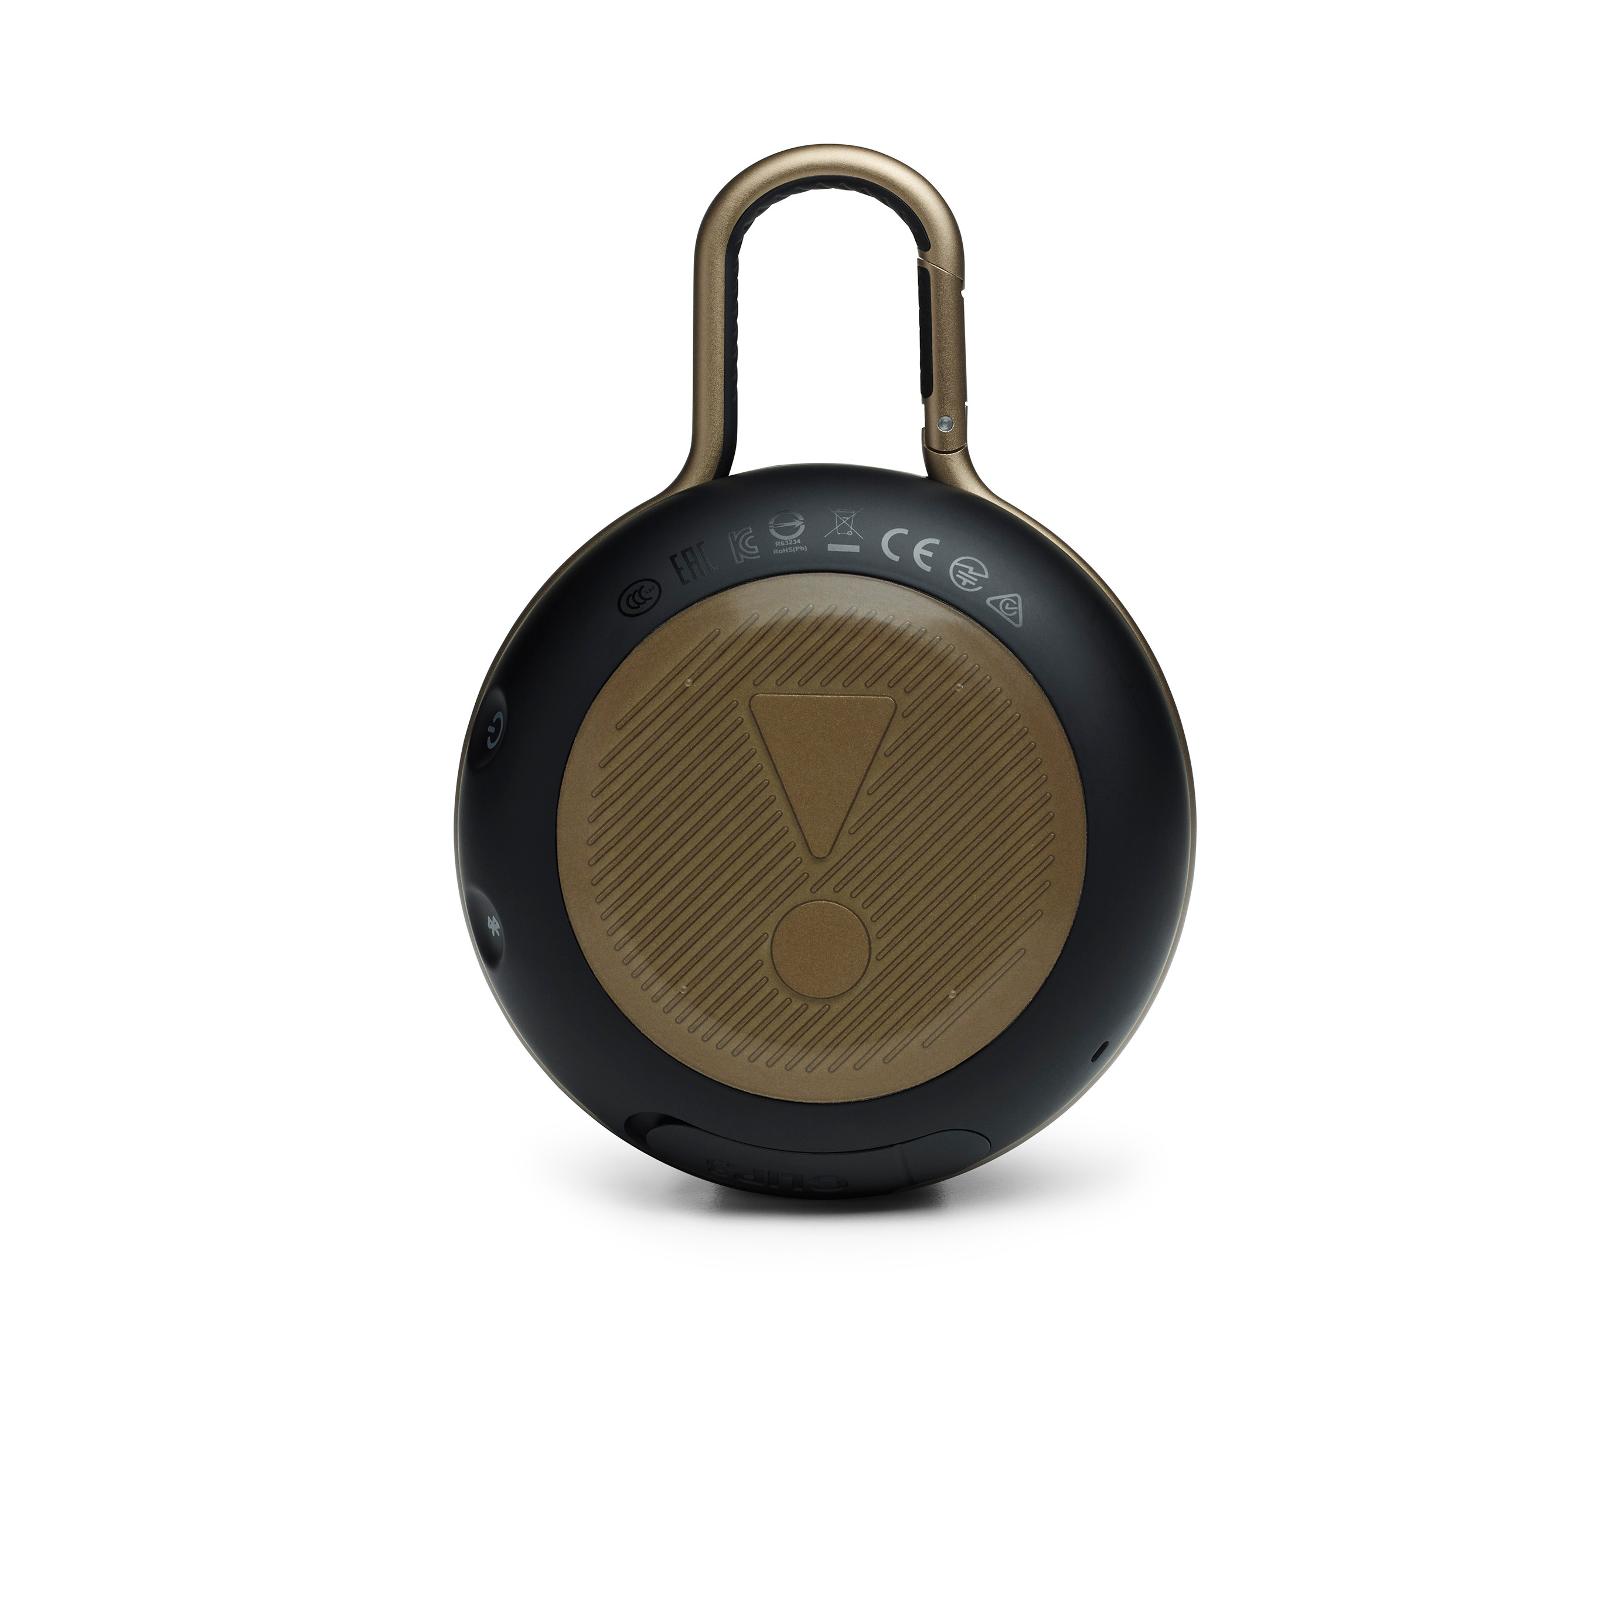 JBL CLIP 3 - BlackWhite/Brown Camo - Portable Bluetooth® speaker - Back